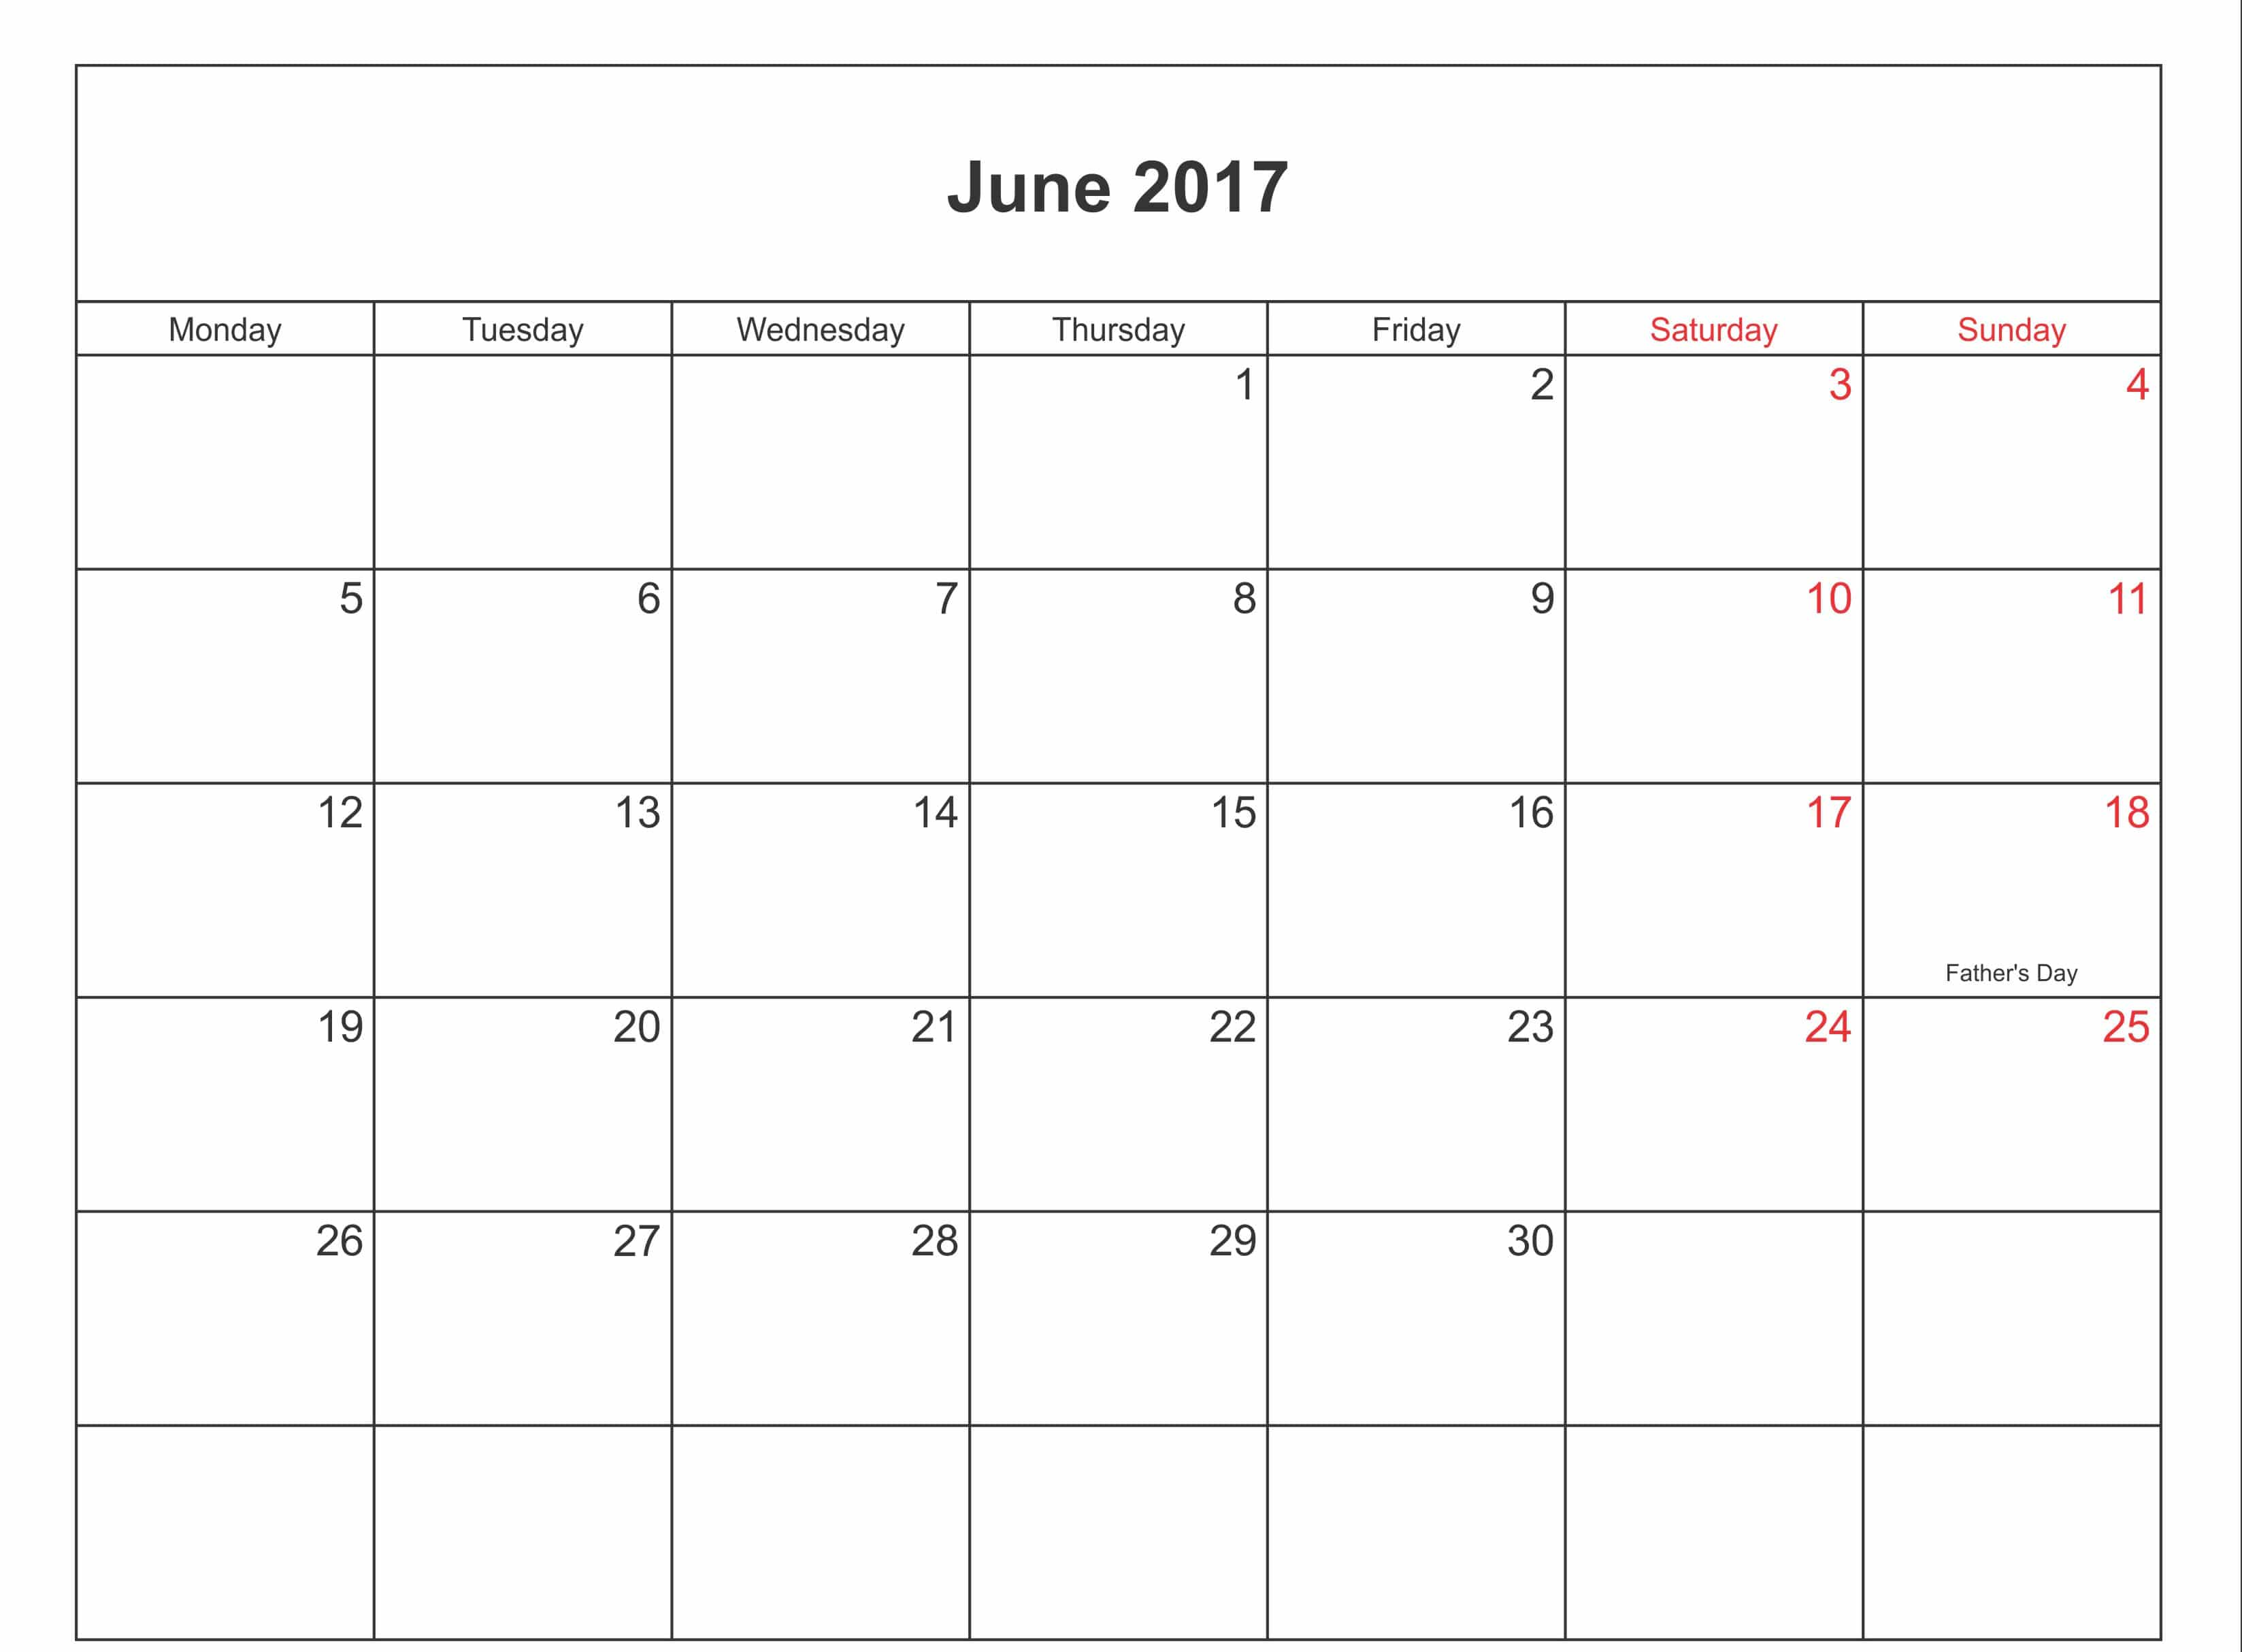 Free June 2017 Calendar With Holidays UK